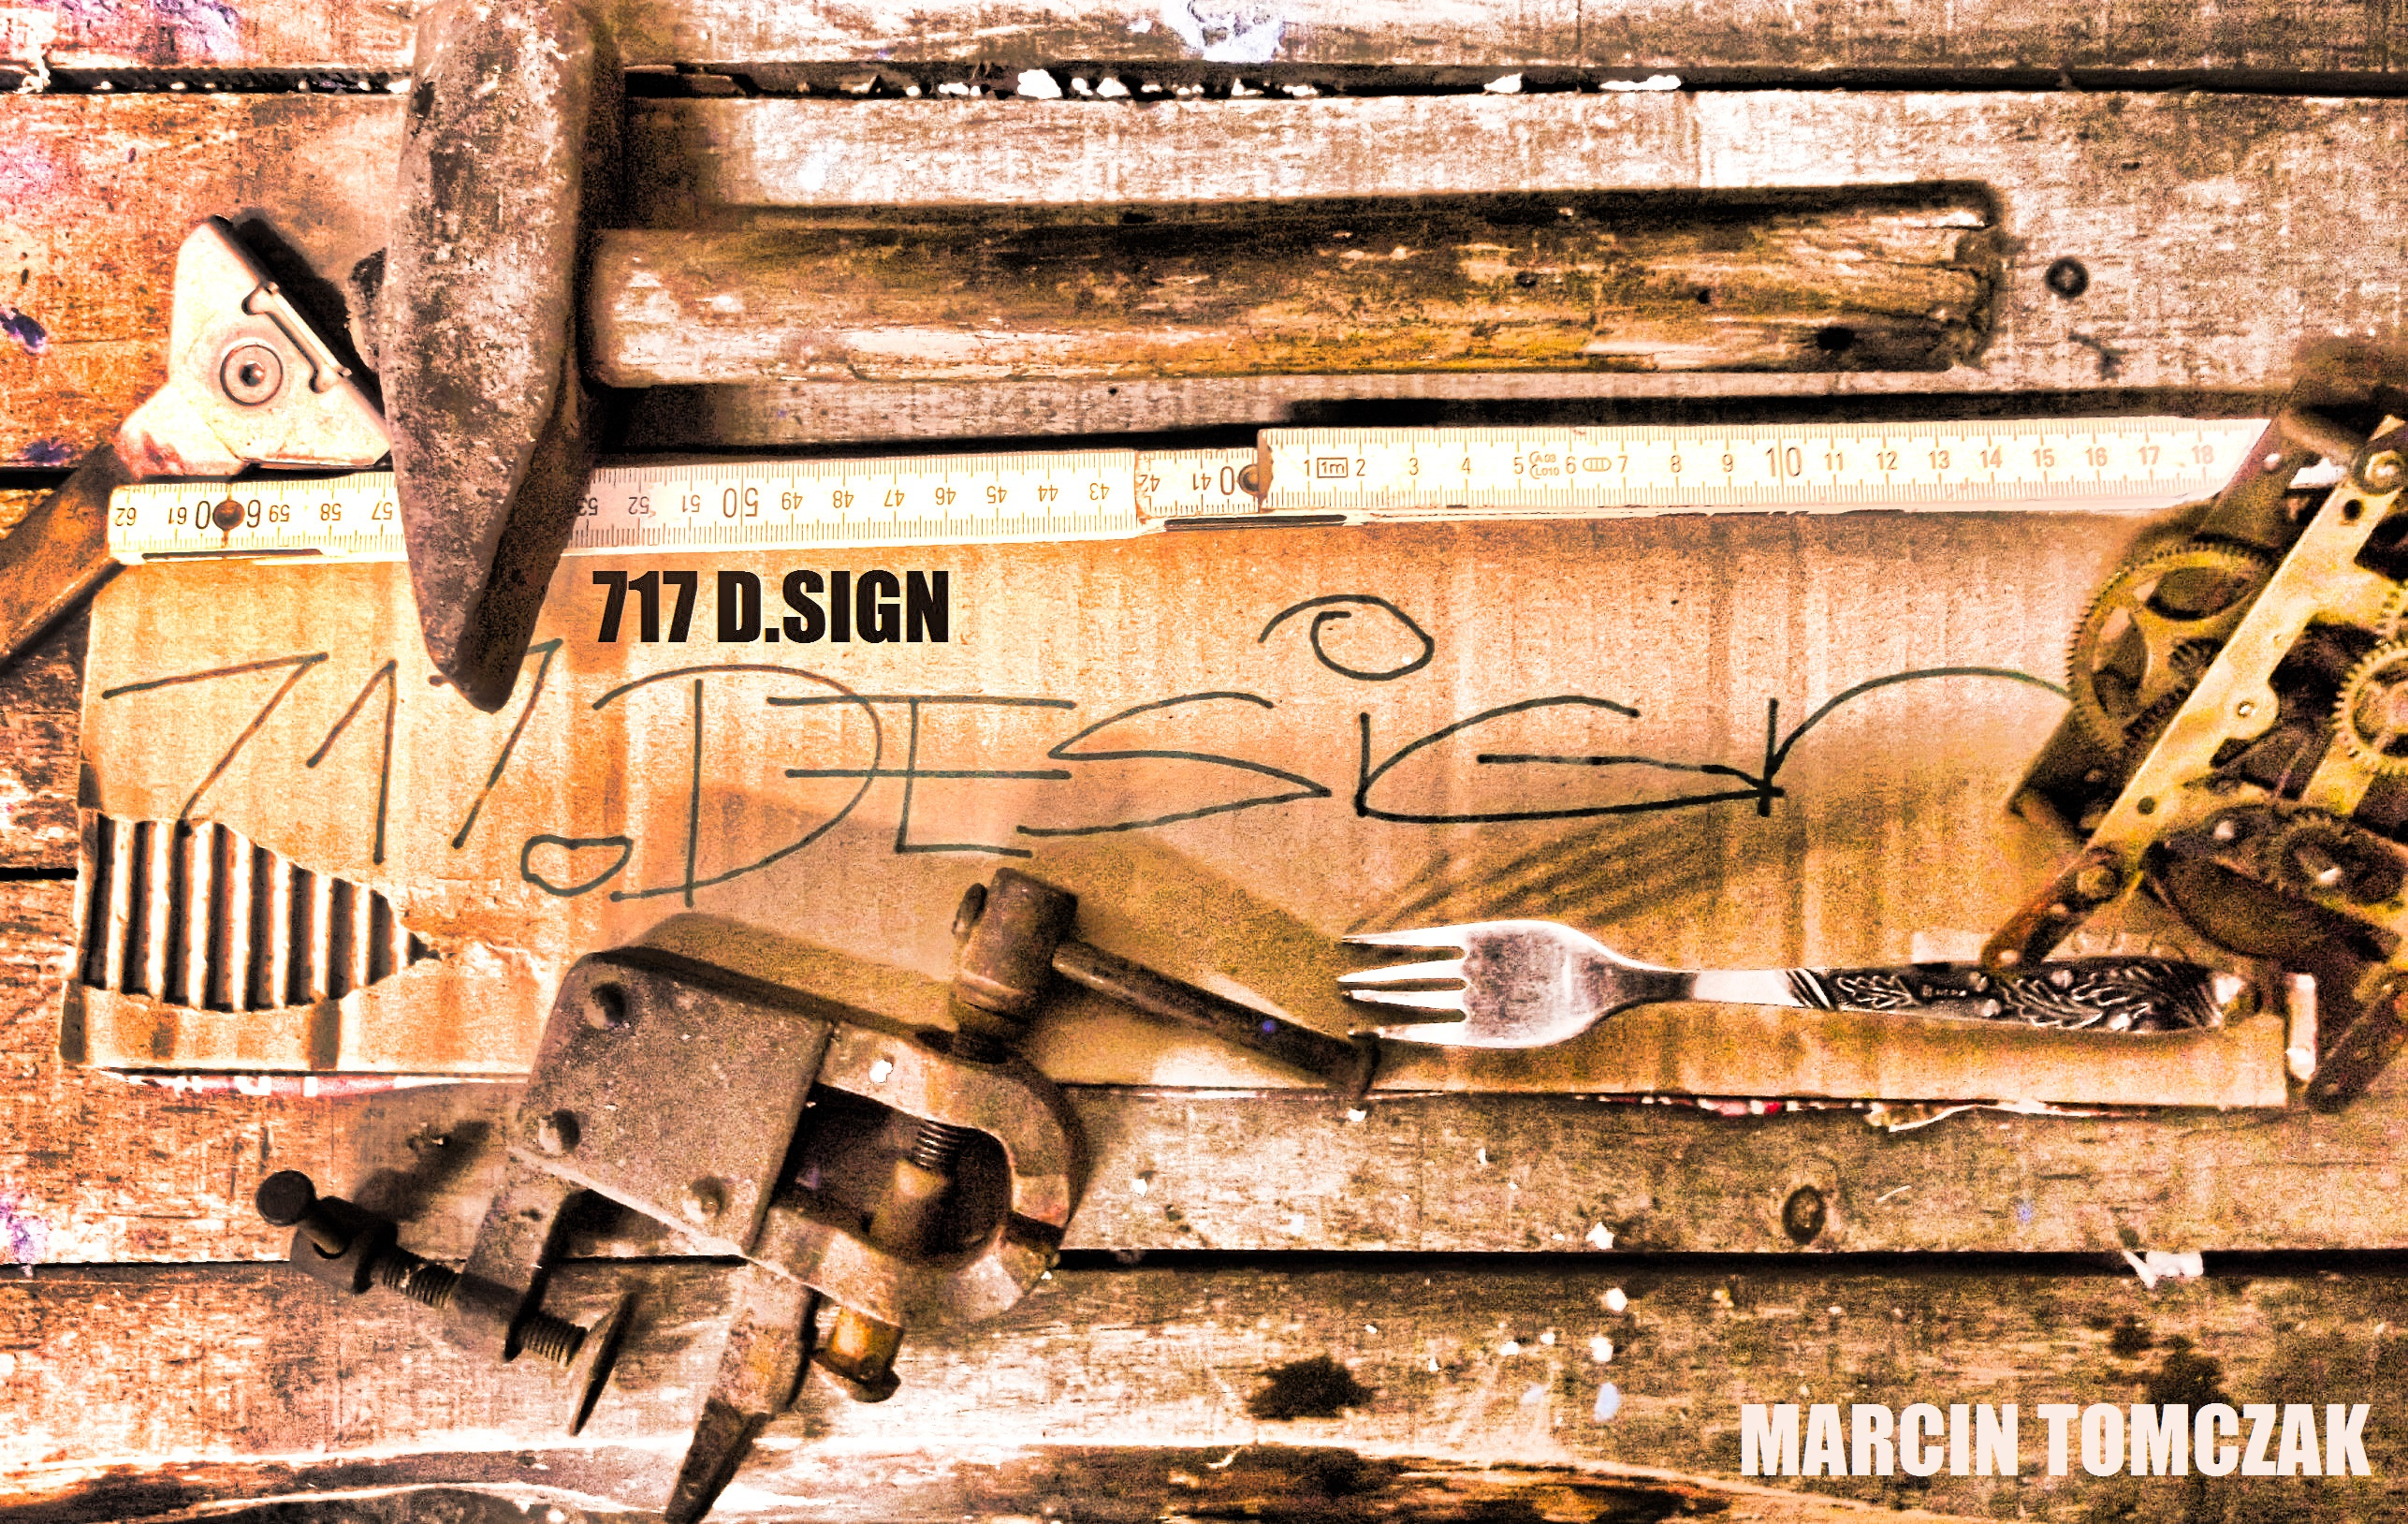 Marcin Tomczak's Signature